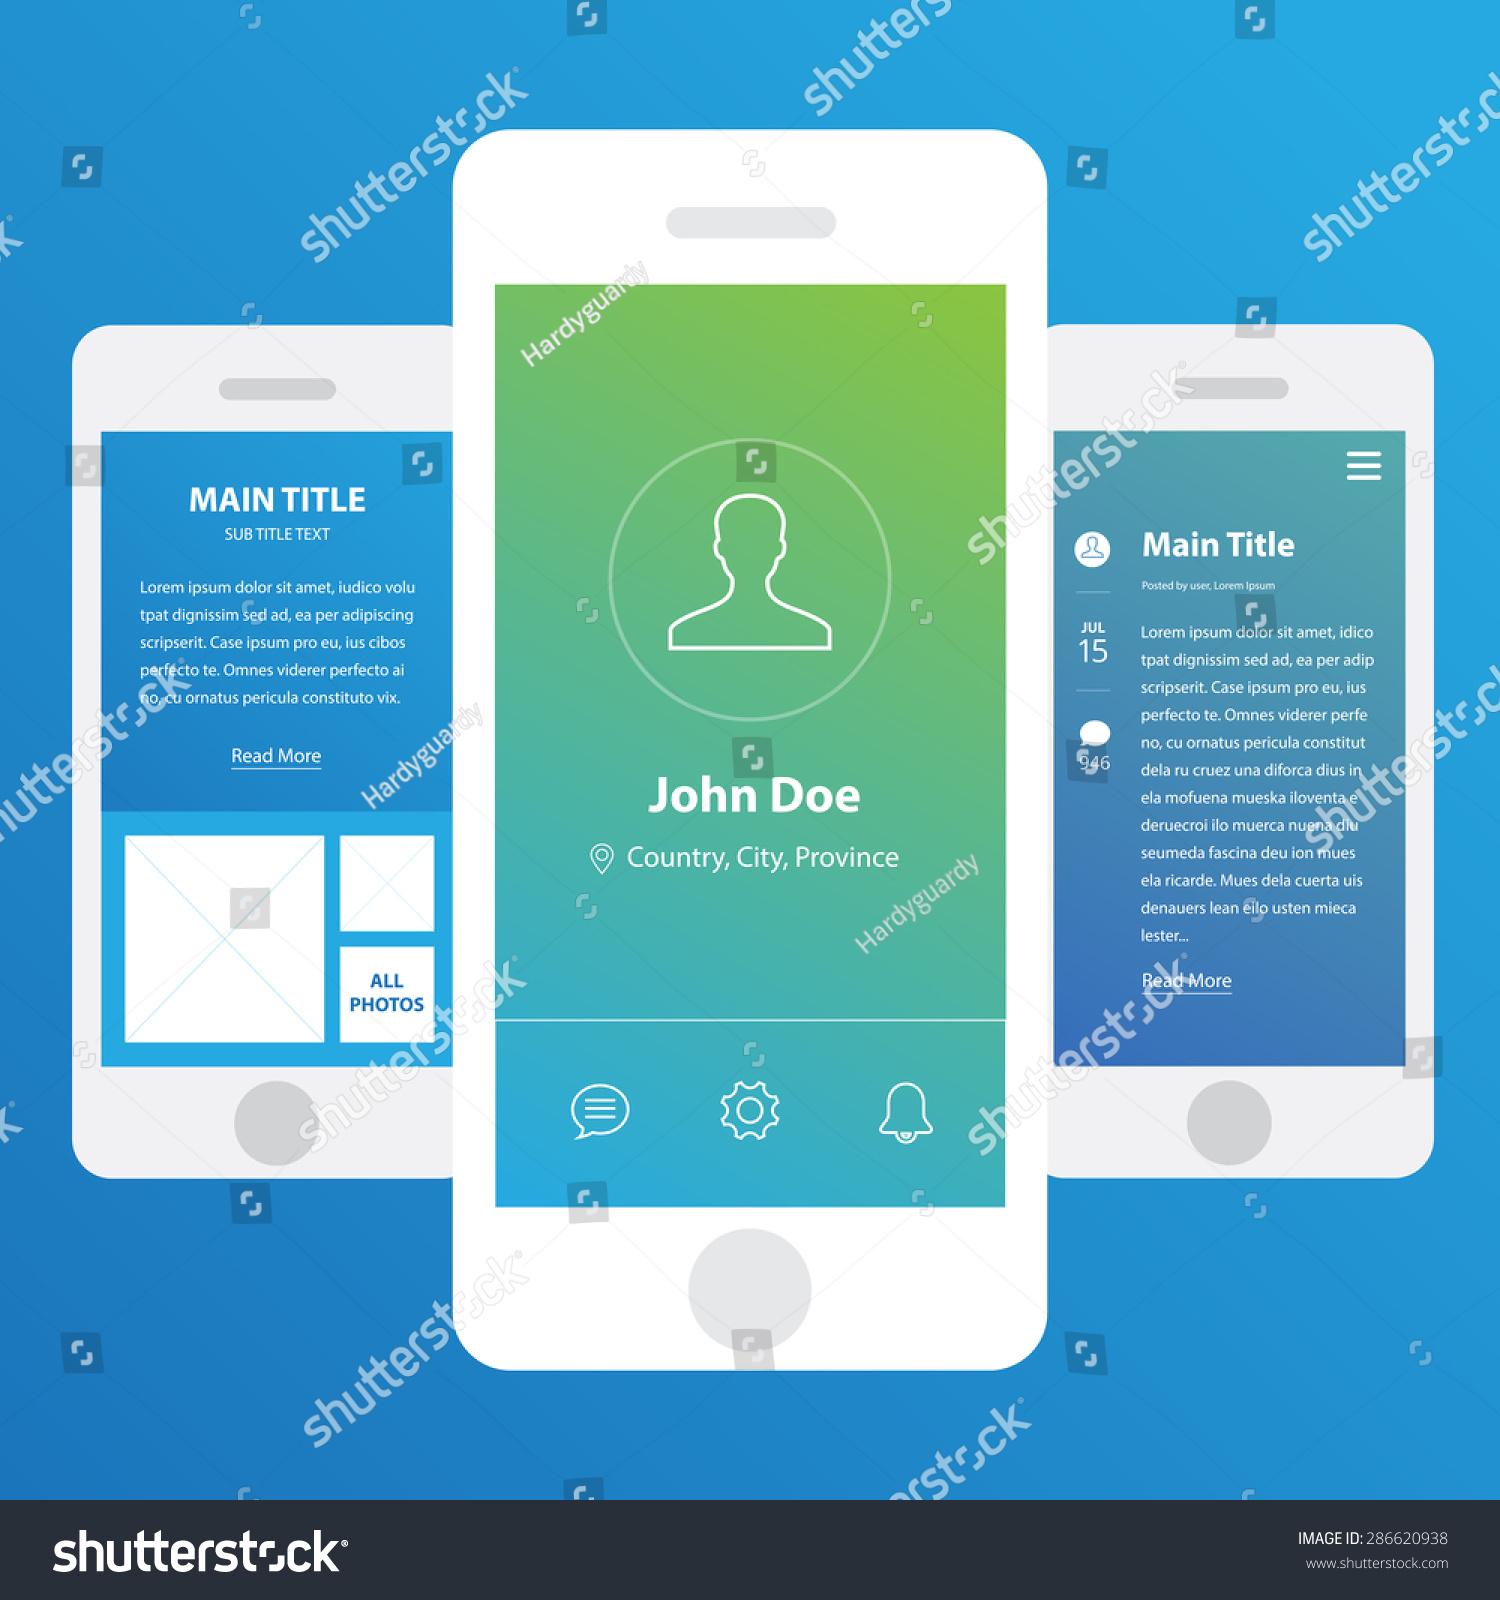 wireframe mobile app ui kit profile stock vector  wireframe mobile app ui kit profile screen wireframe mobile app ui kit blog post screen